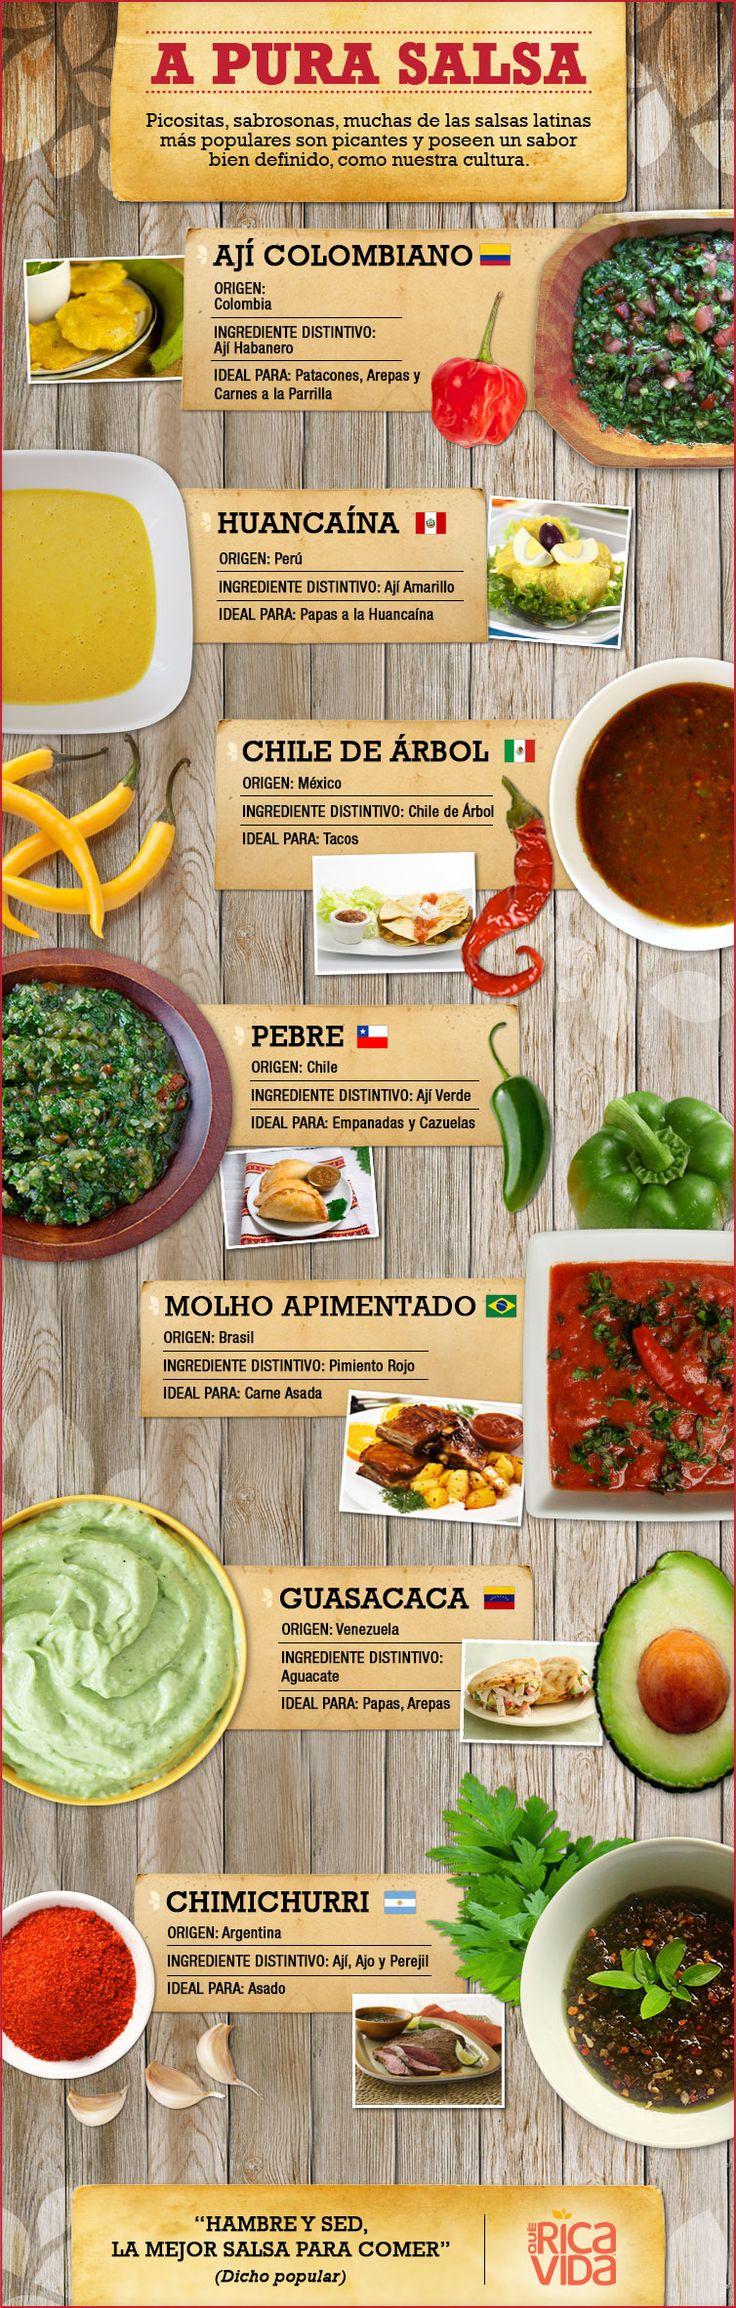 Salsa Picante – 7 Salsas Picantes Latinas | QueRicaVida.com (In Spanish)